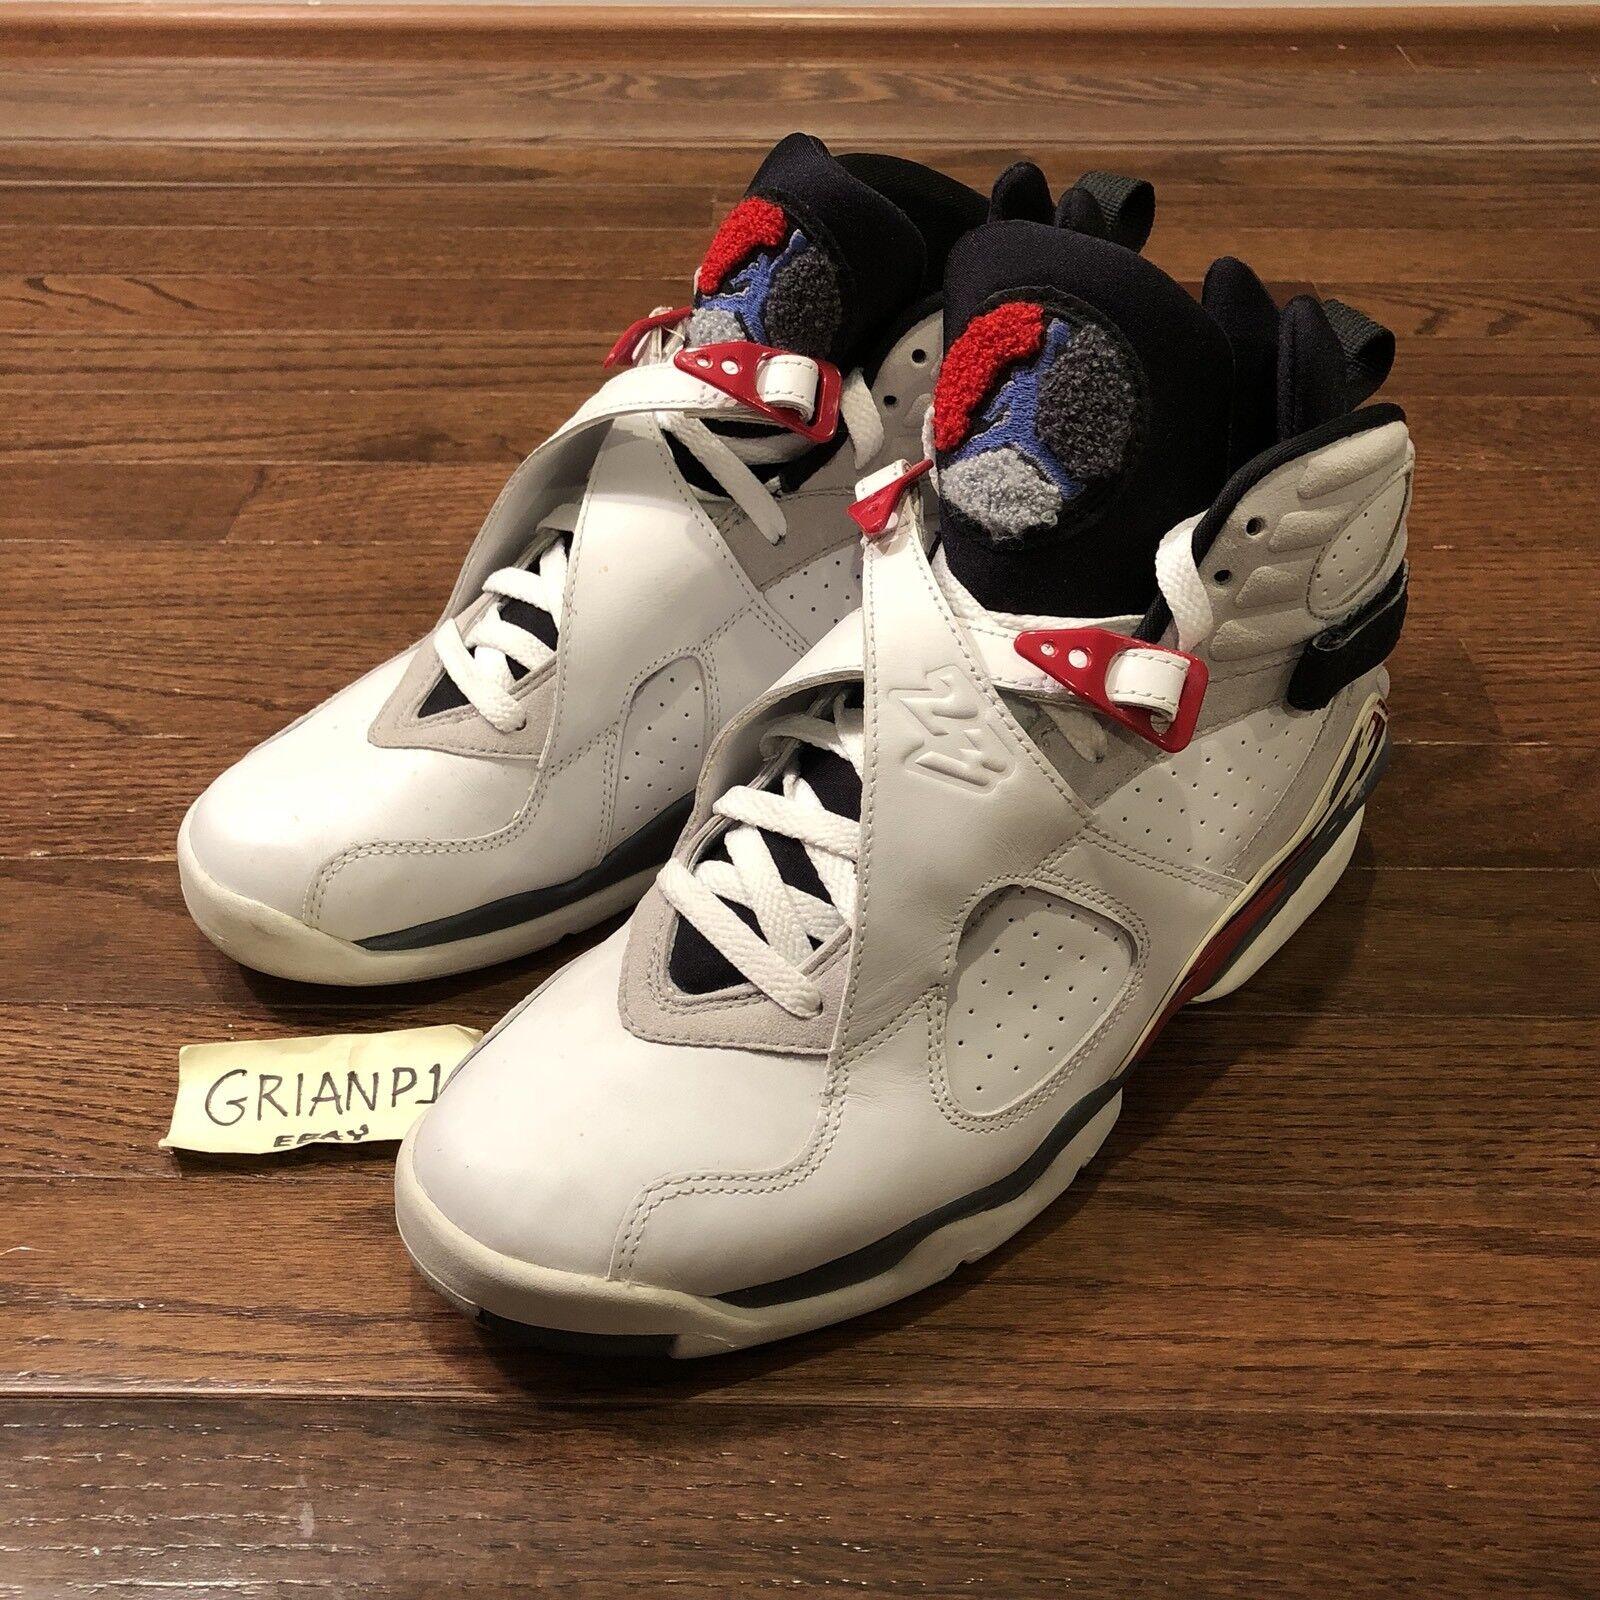 Vintage 2002 Hare Nike Air Jordan VIII 8 Bugs Bunny Hare 2002 305381-101 Size 10 3ff3e8